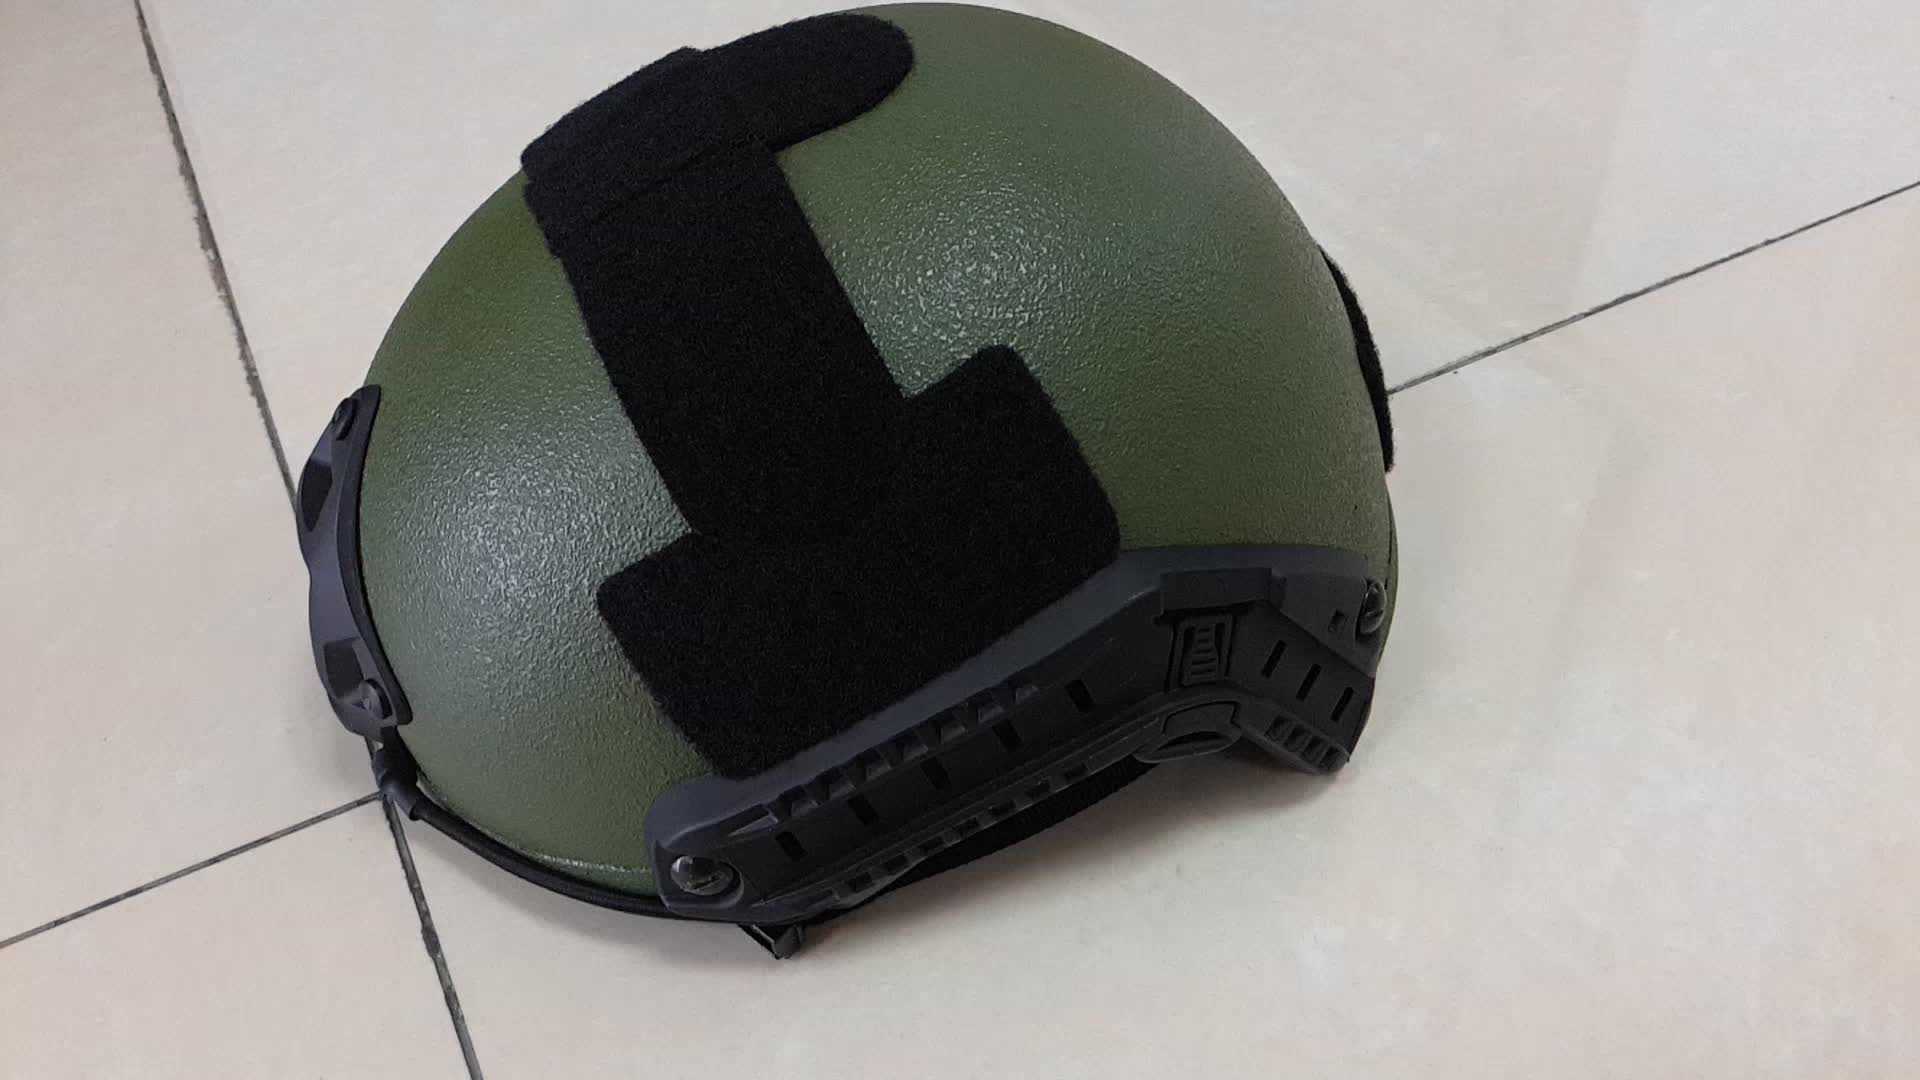 NIJ 0106.01 IIIA standard High Density Aramid fast style Bulletproof Helmet for military army